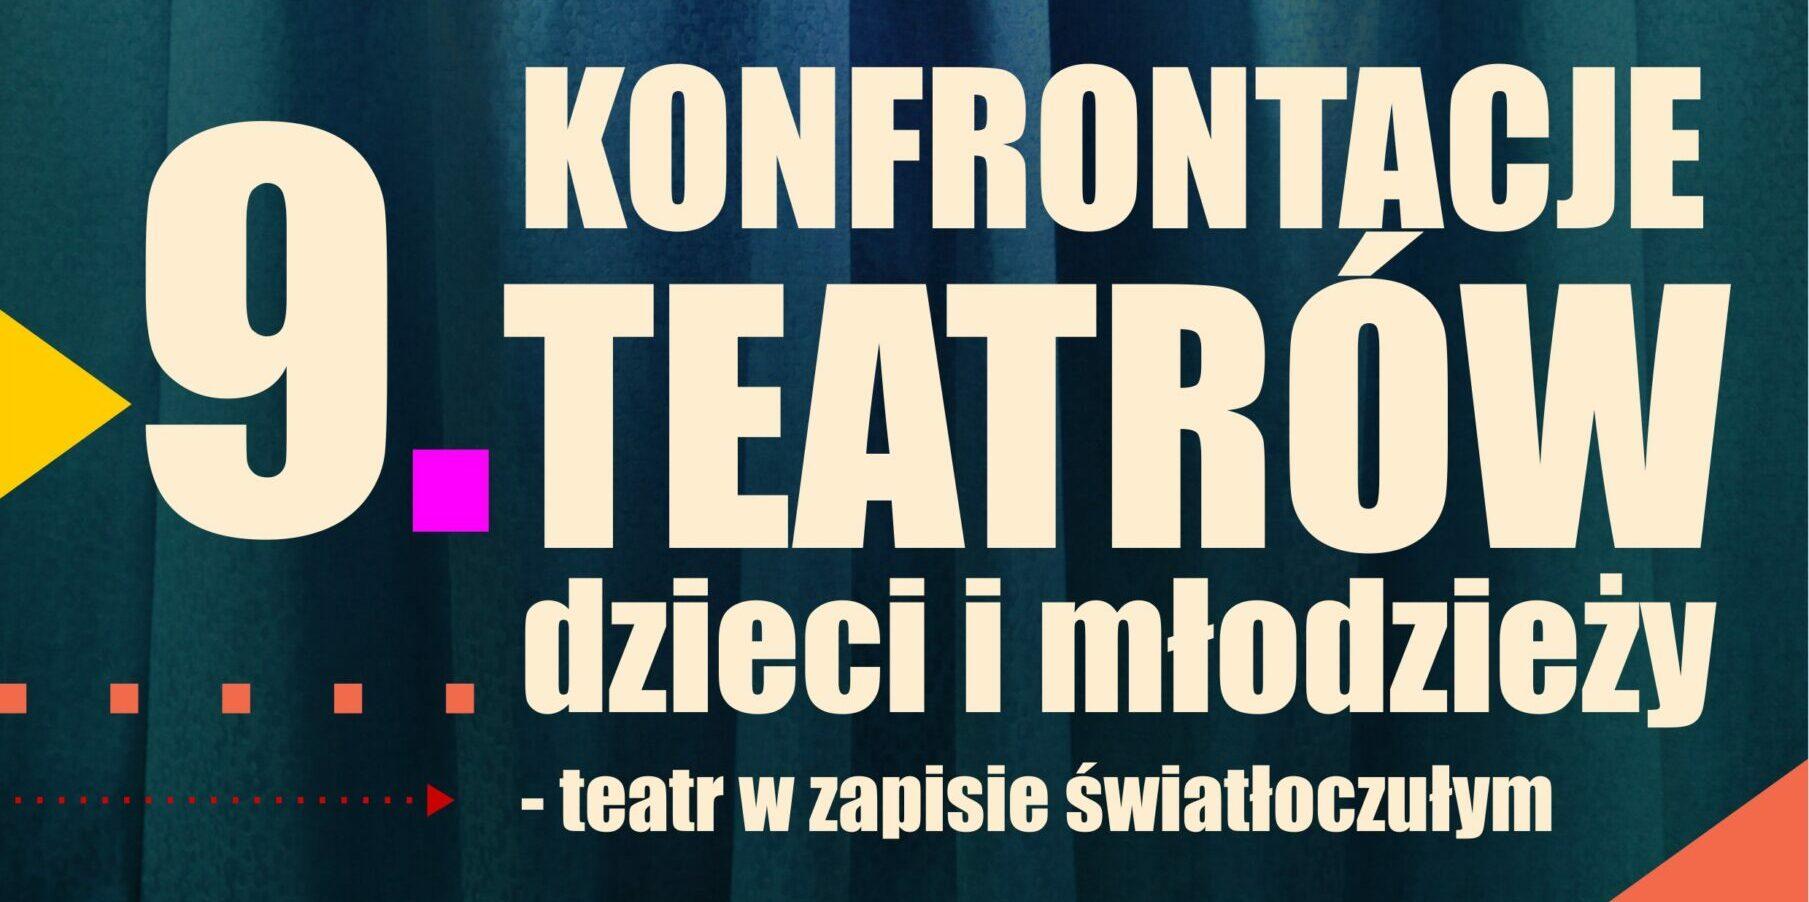 Teatralne Lustra – regulamin i karta zgłoszenia